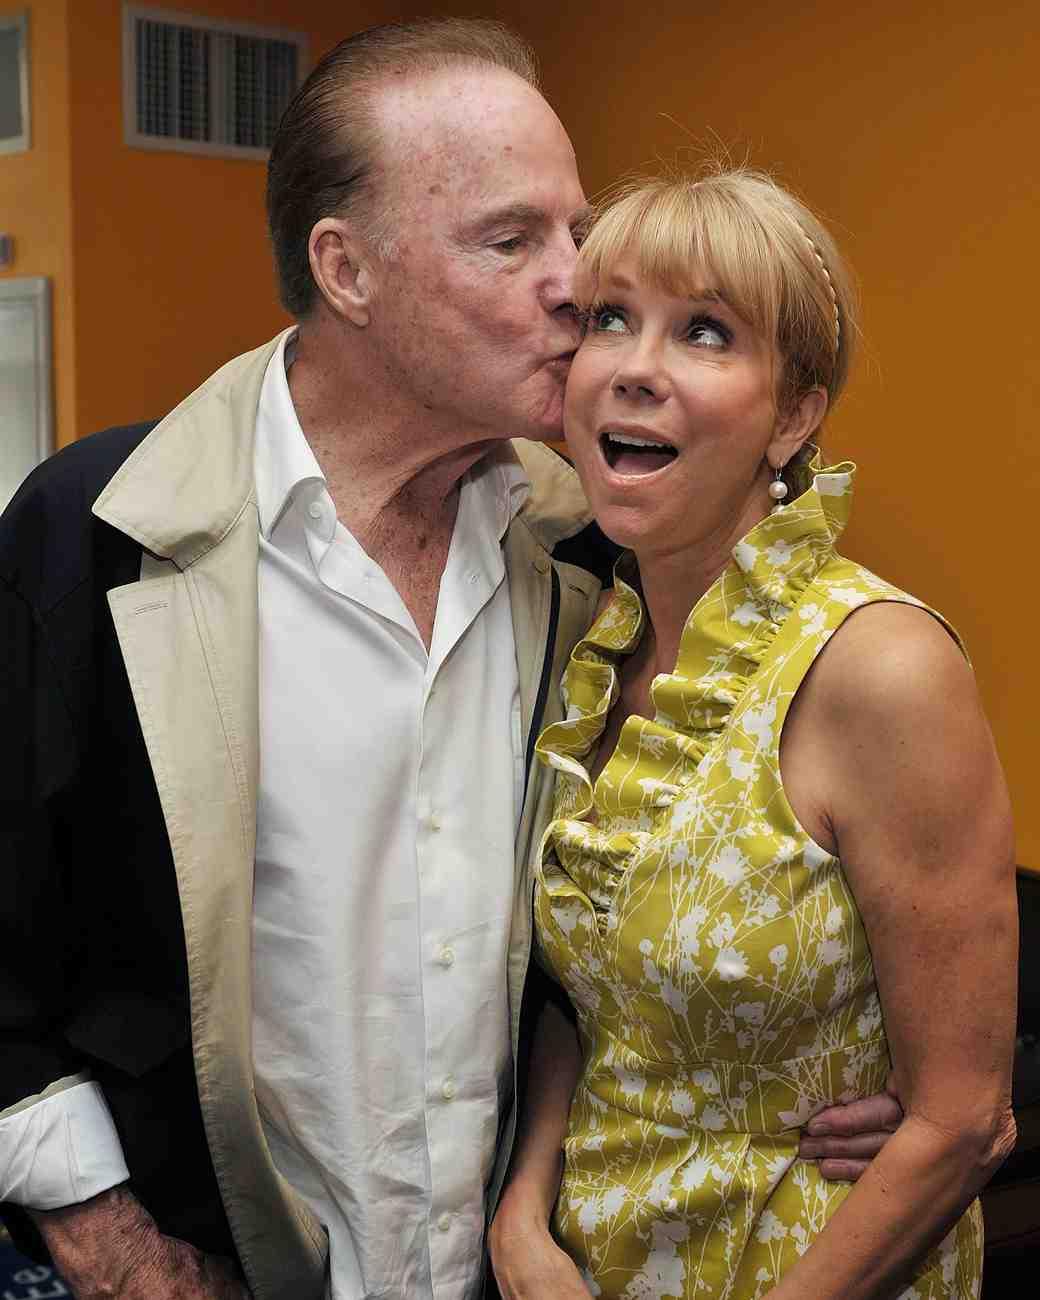 kathy-lee-gifford-frank-gifford-iconic-hollywood-couples-0216.jpg